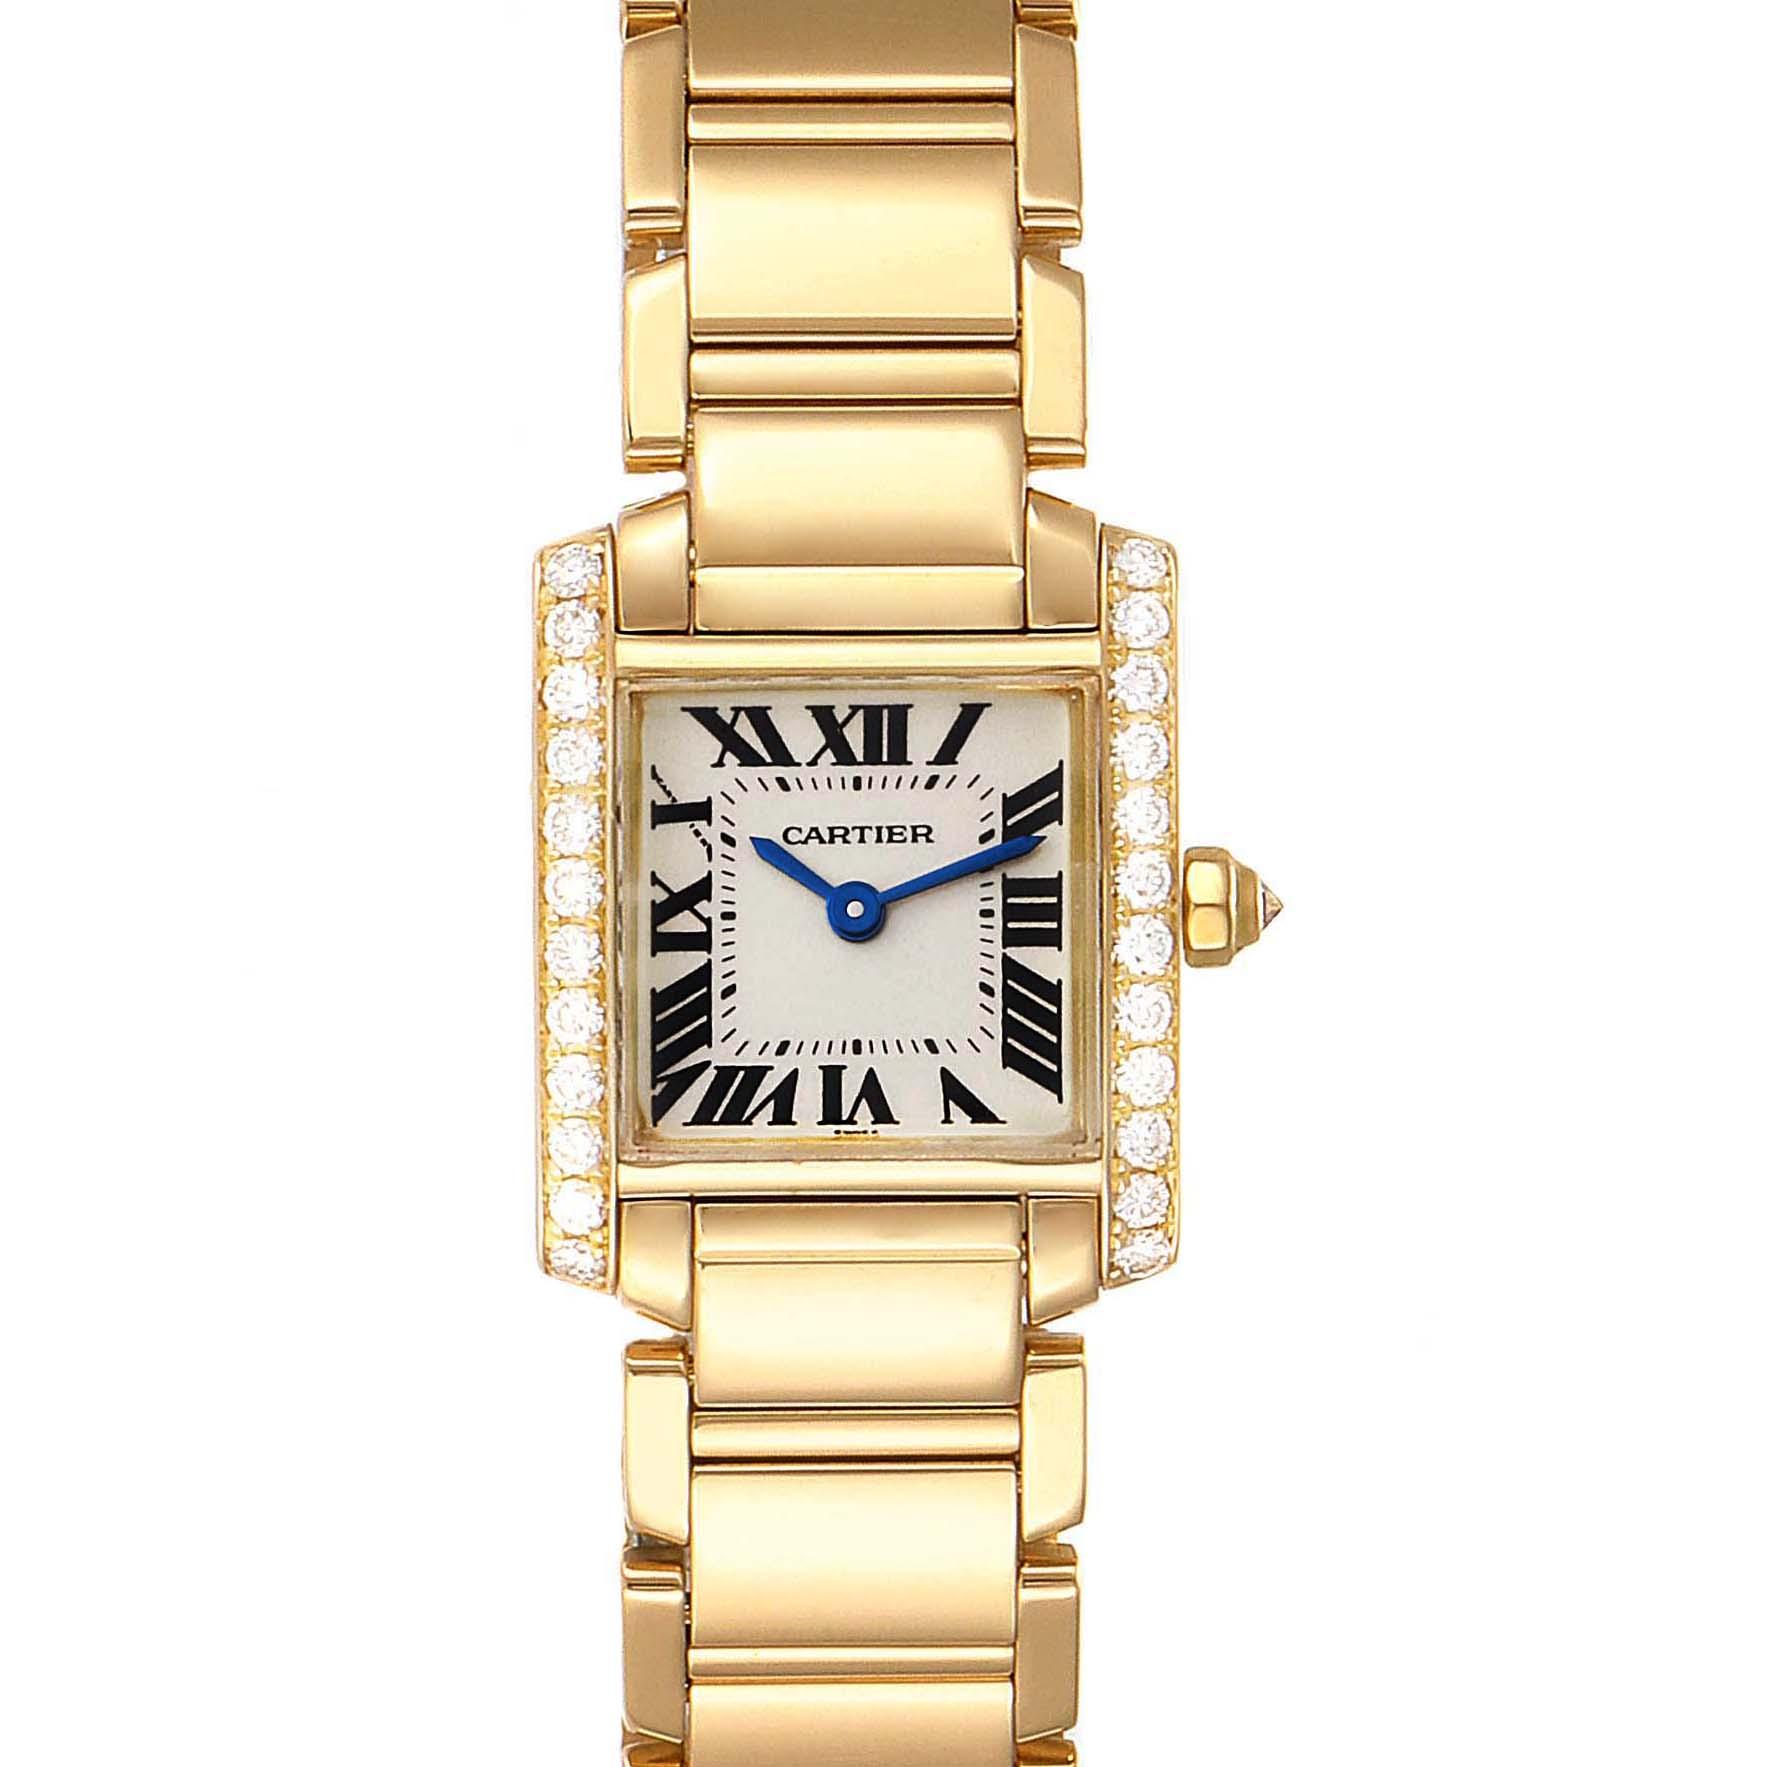 Cartier Tank Francaise 18K Yellow Gold Diamond Ladies Watch WE1001R8